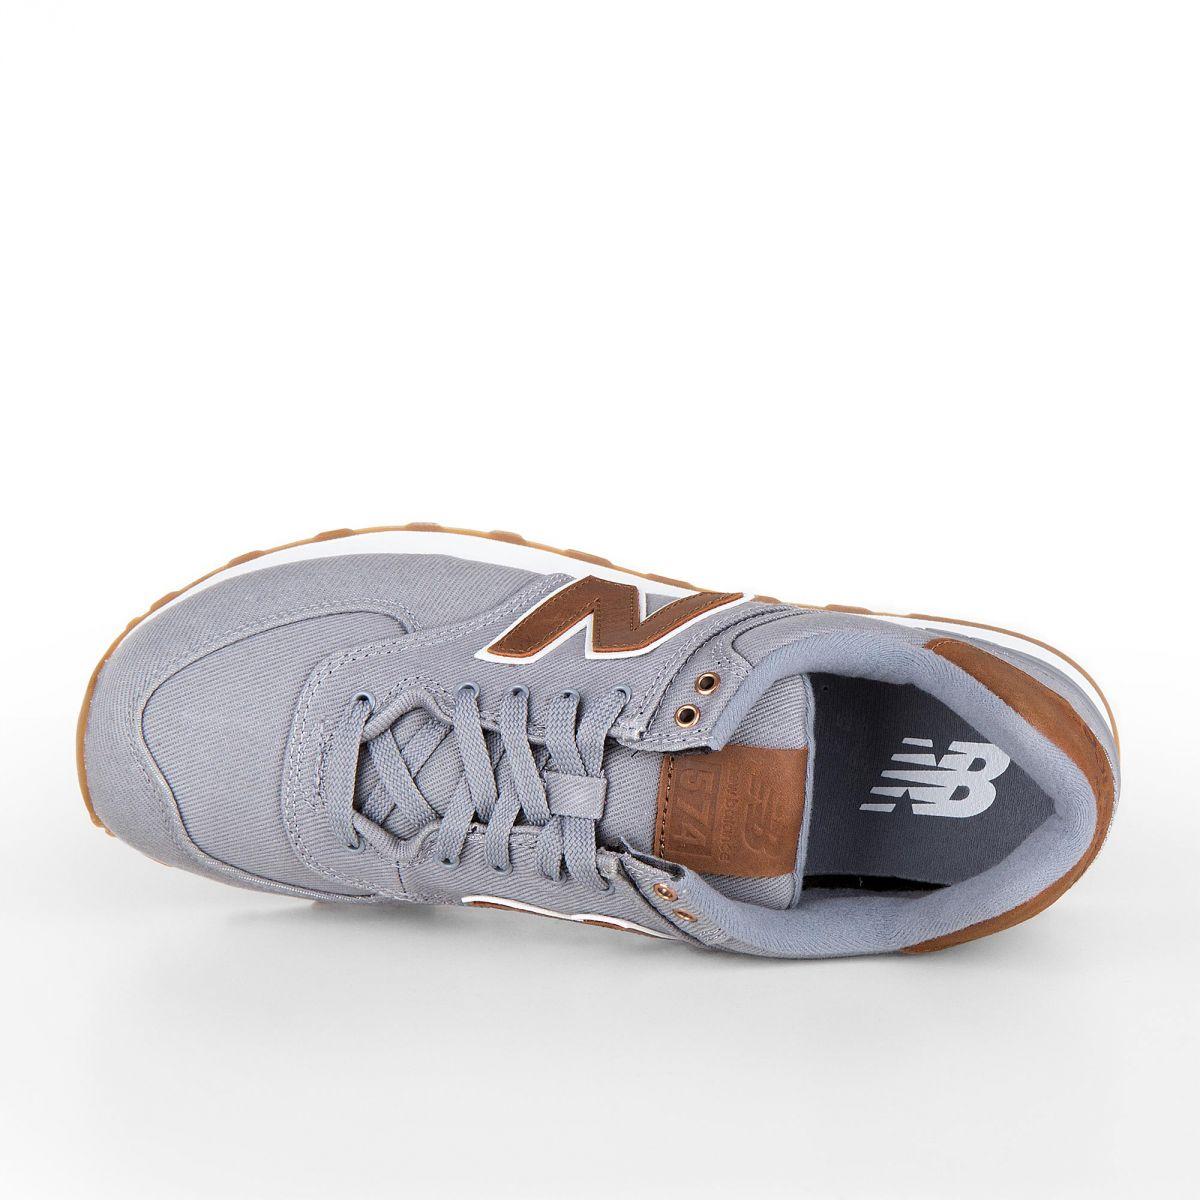 À Homme Sneakers Marron Grisamp; Ml574txc Prix New Baskets Balance qARjL435Sc